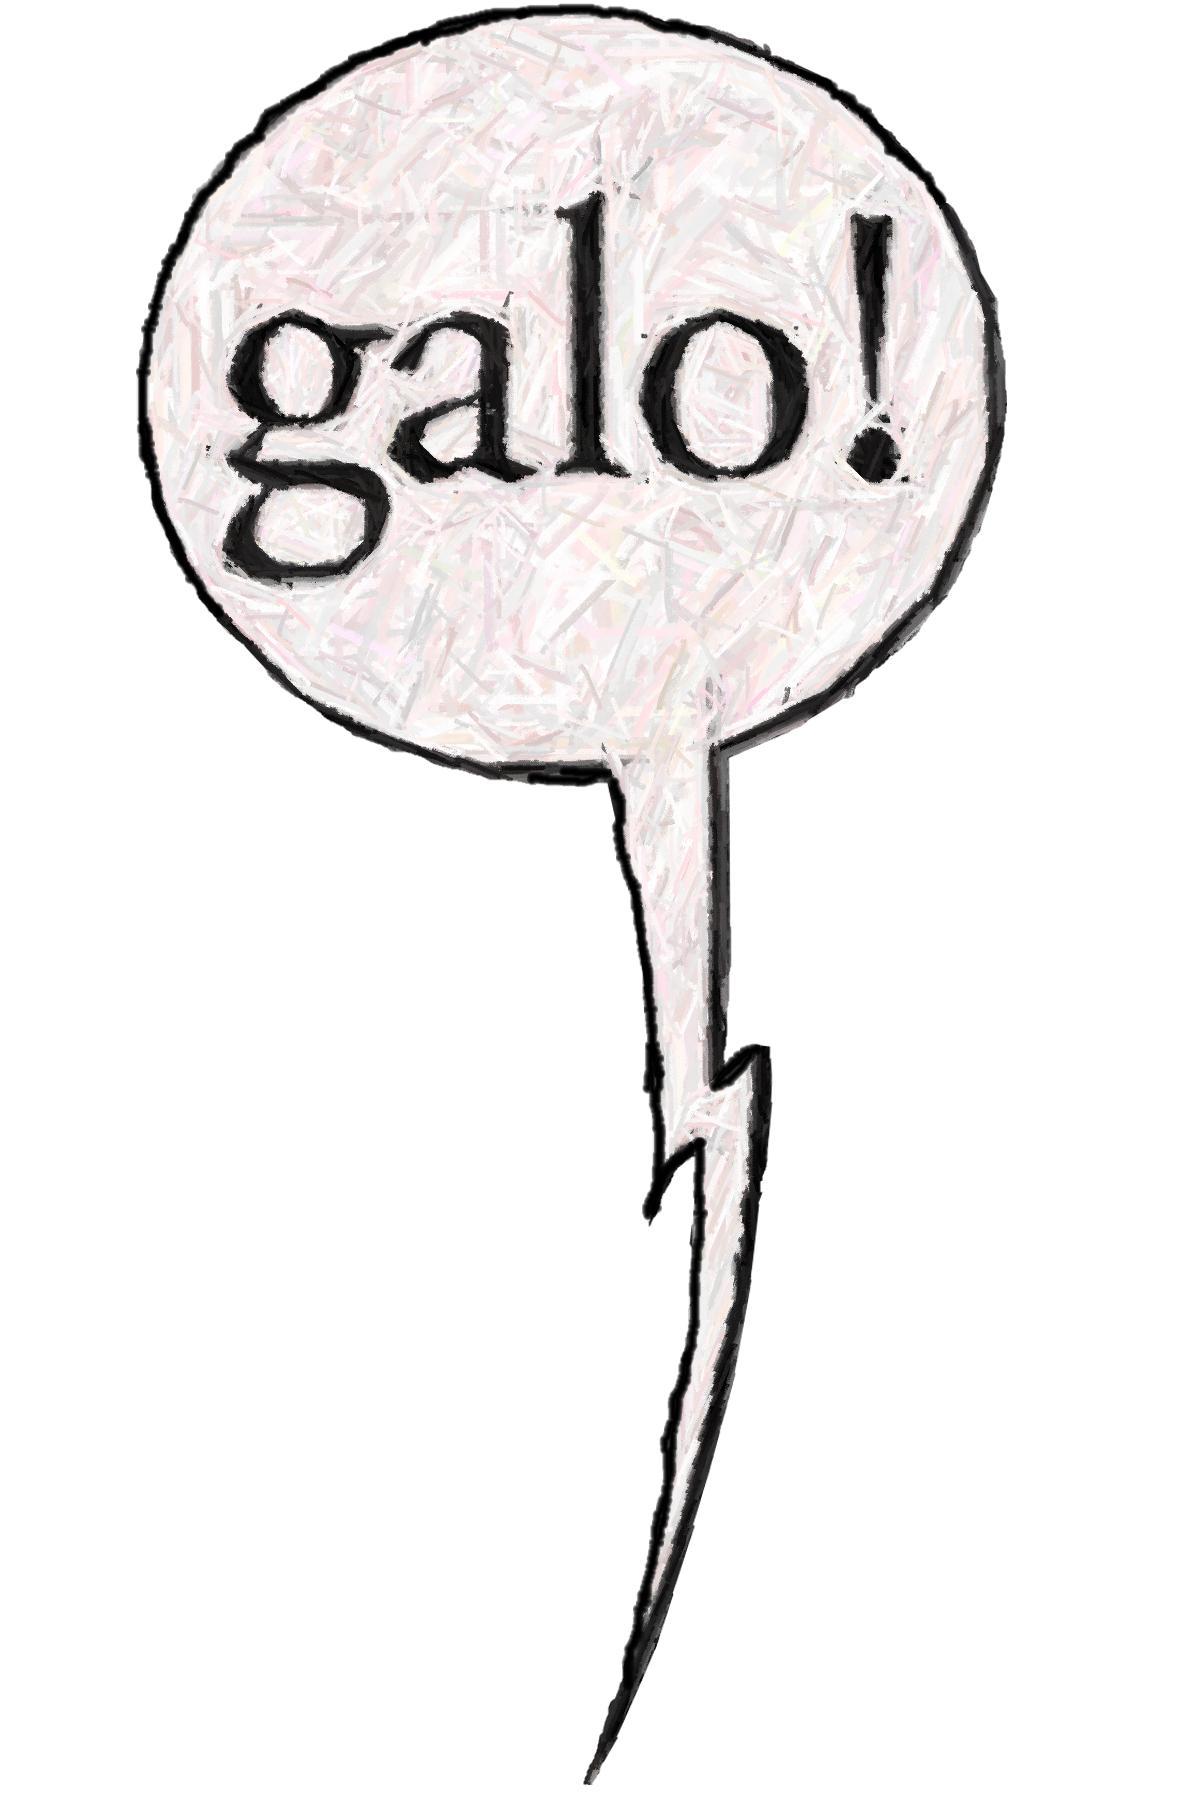 bulle gallo